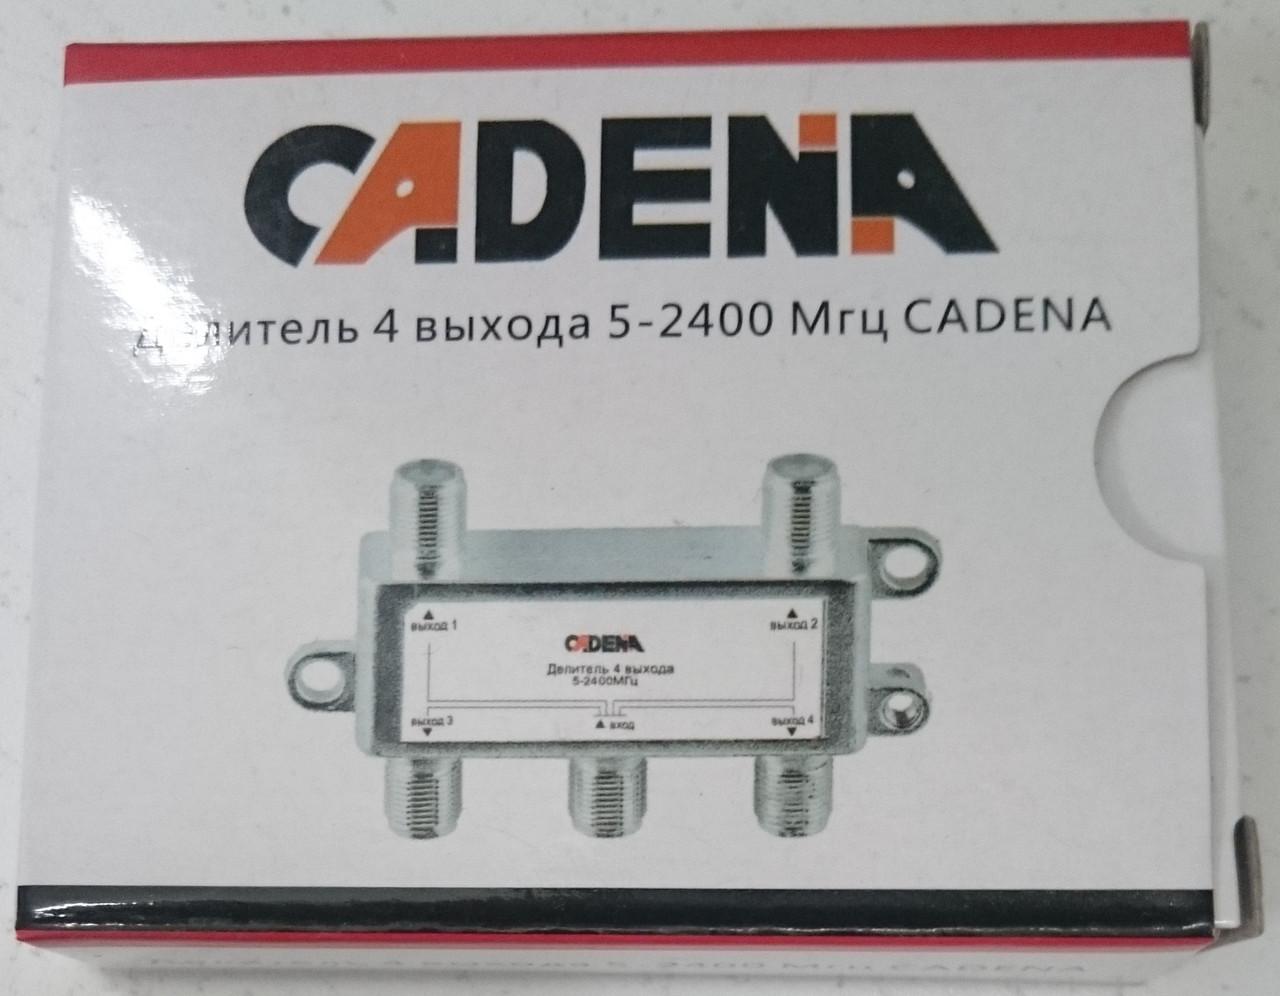 Сплиттер  Cadena 4 отвода   5-2400 MHz